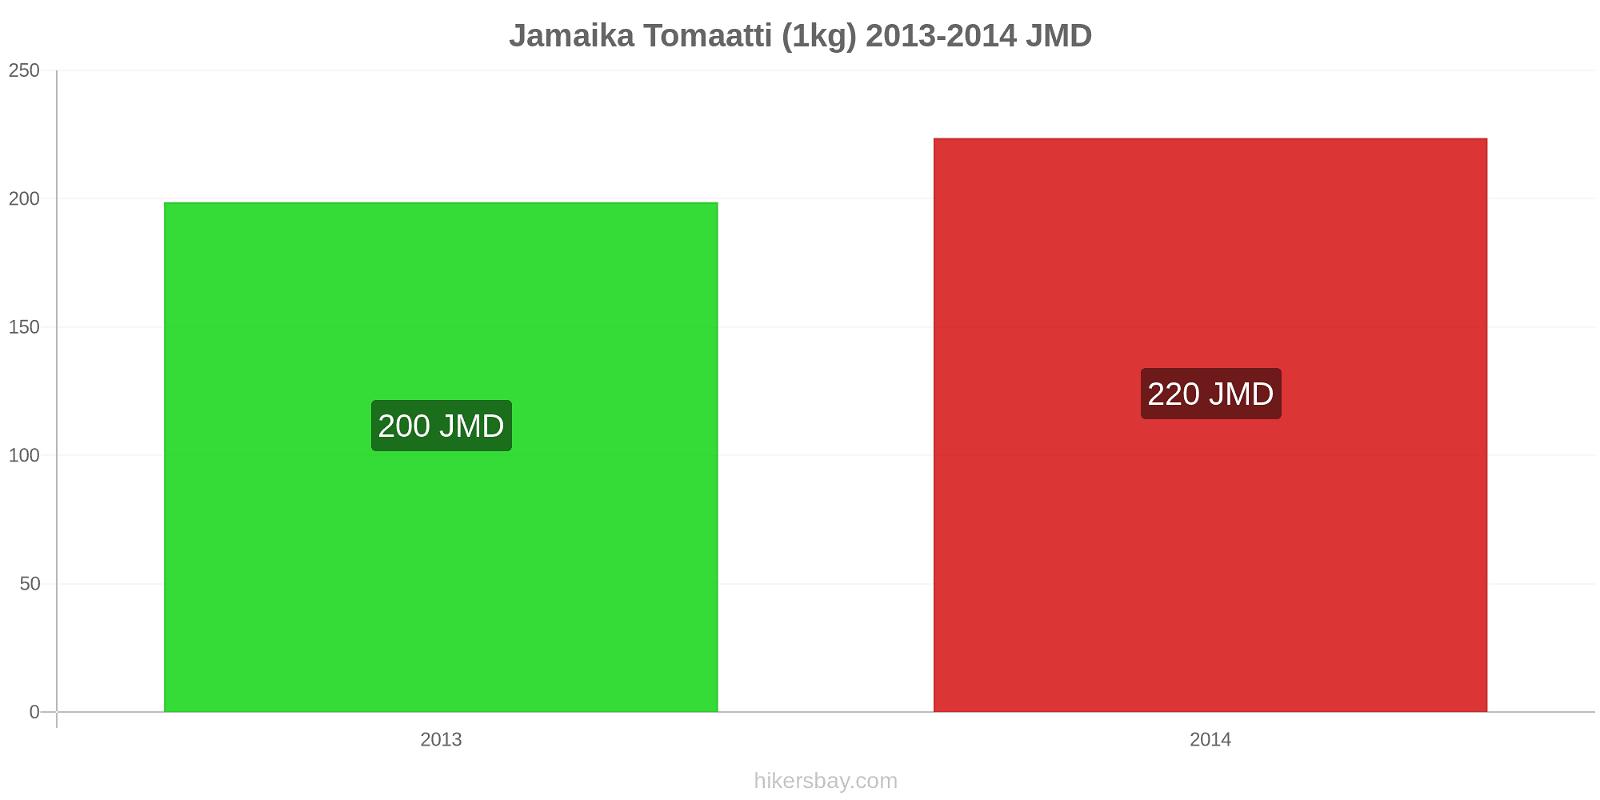 Jamaika hintojen muutokset Tomaatti (1kg) hikersbay.com